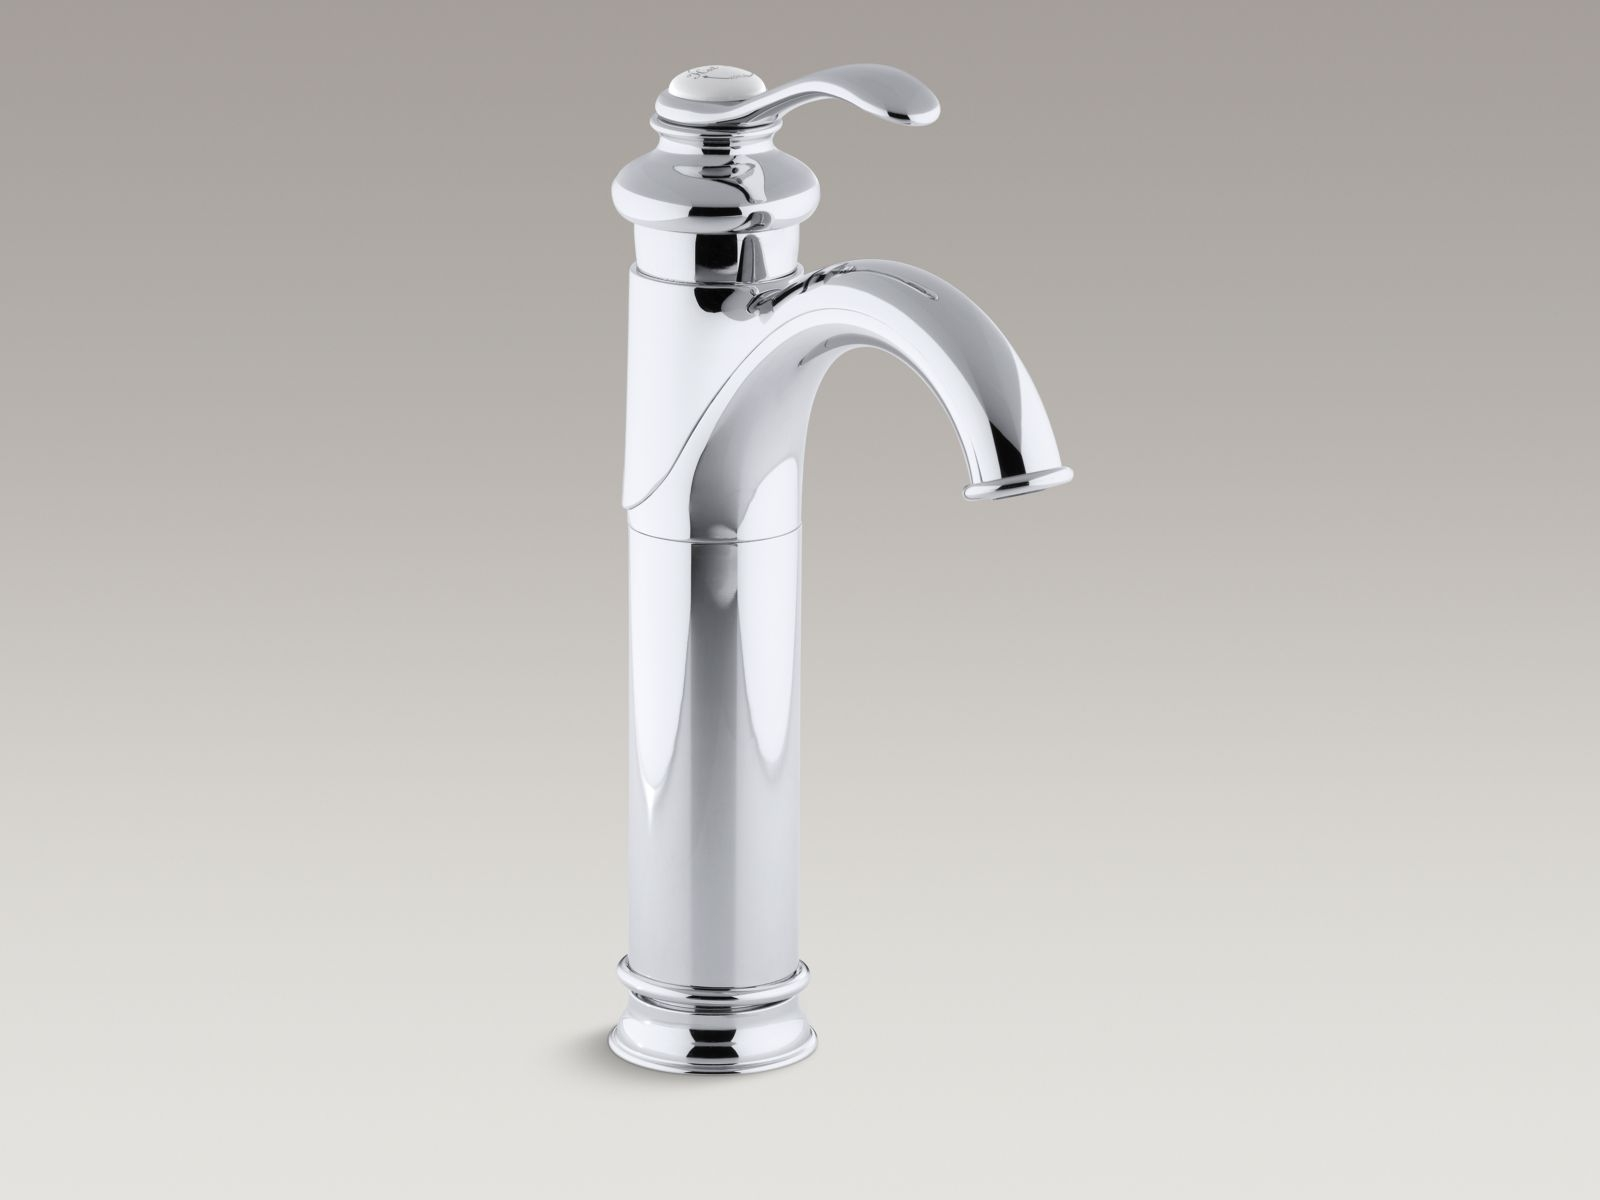 Ideas, kohler stance sink faucet kohler stance sink faucet buyplumbing category single handle bathroom faucet 1600 x 1200 1  .